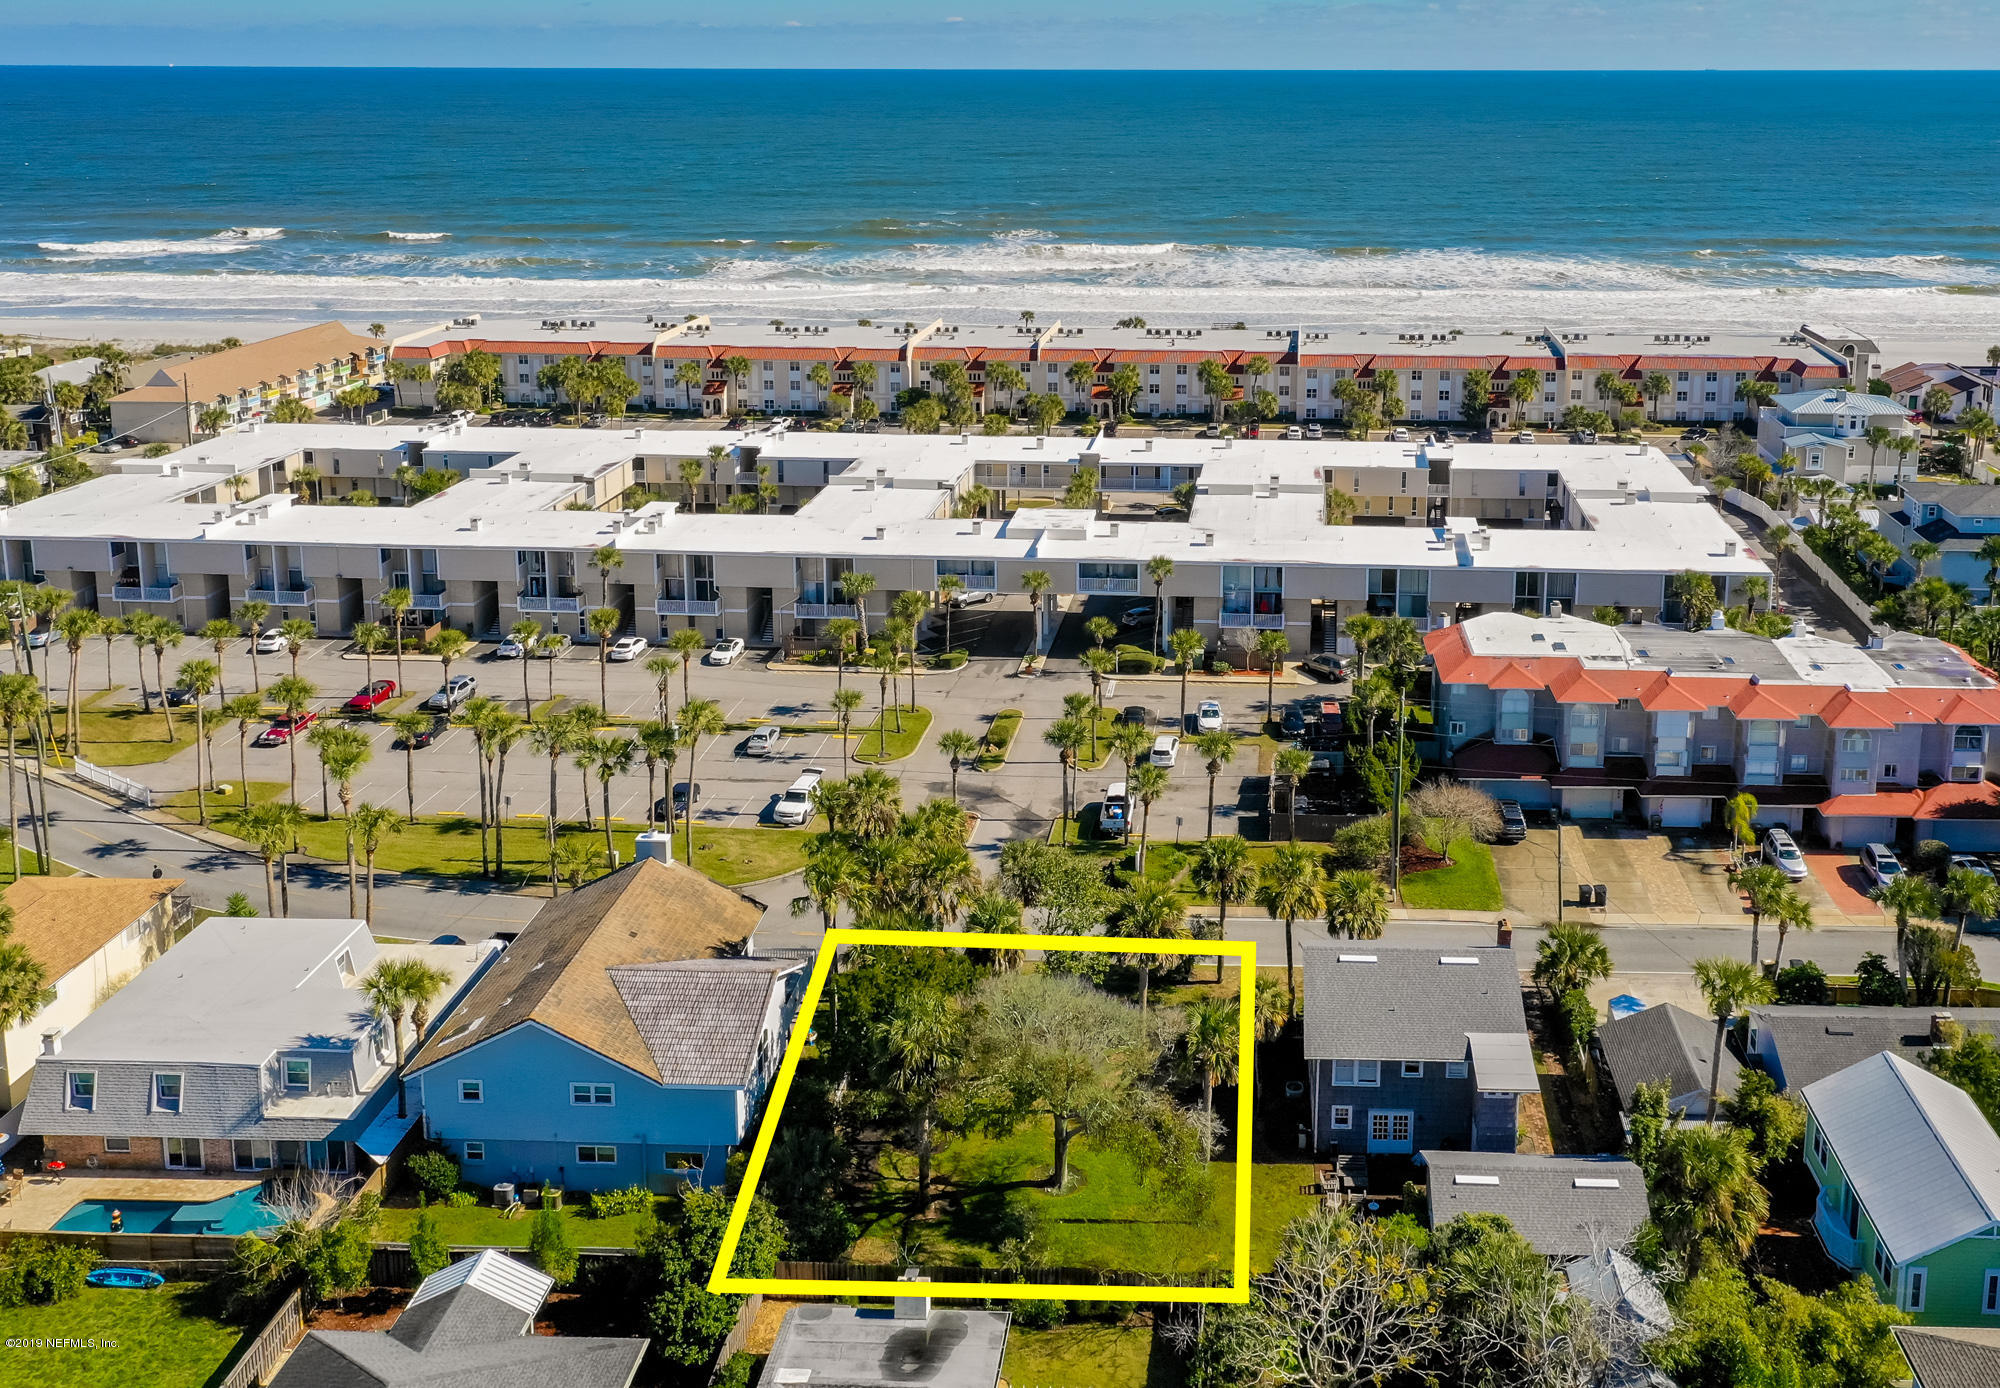 0  OCEAN BLVD, one of homes for sale in Atlantic Beach